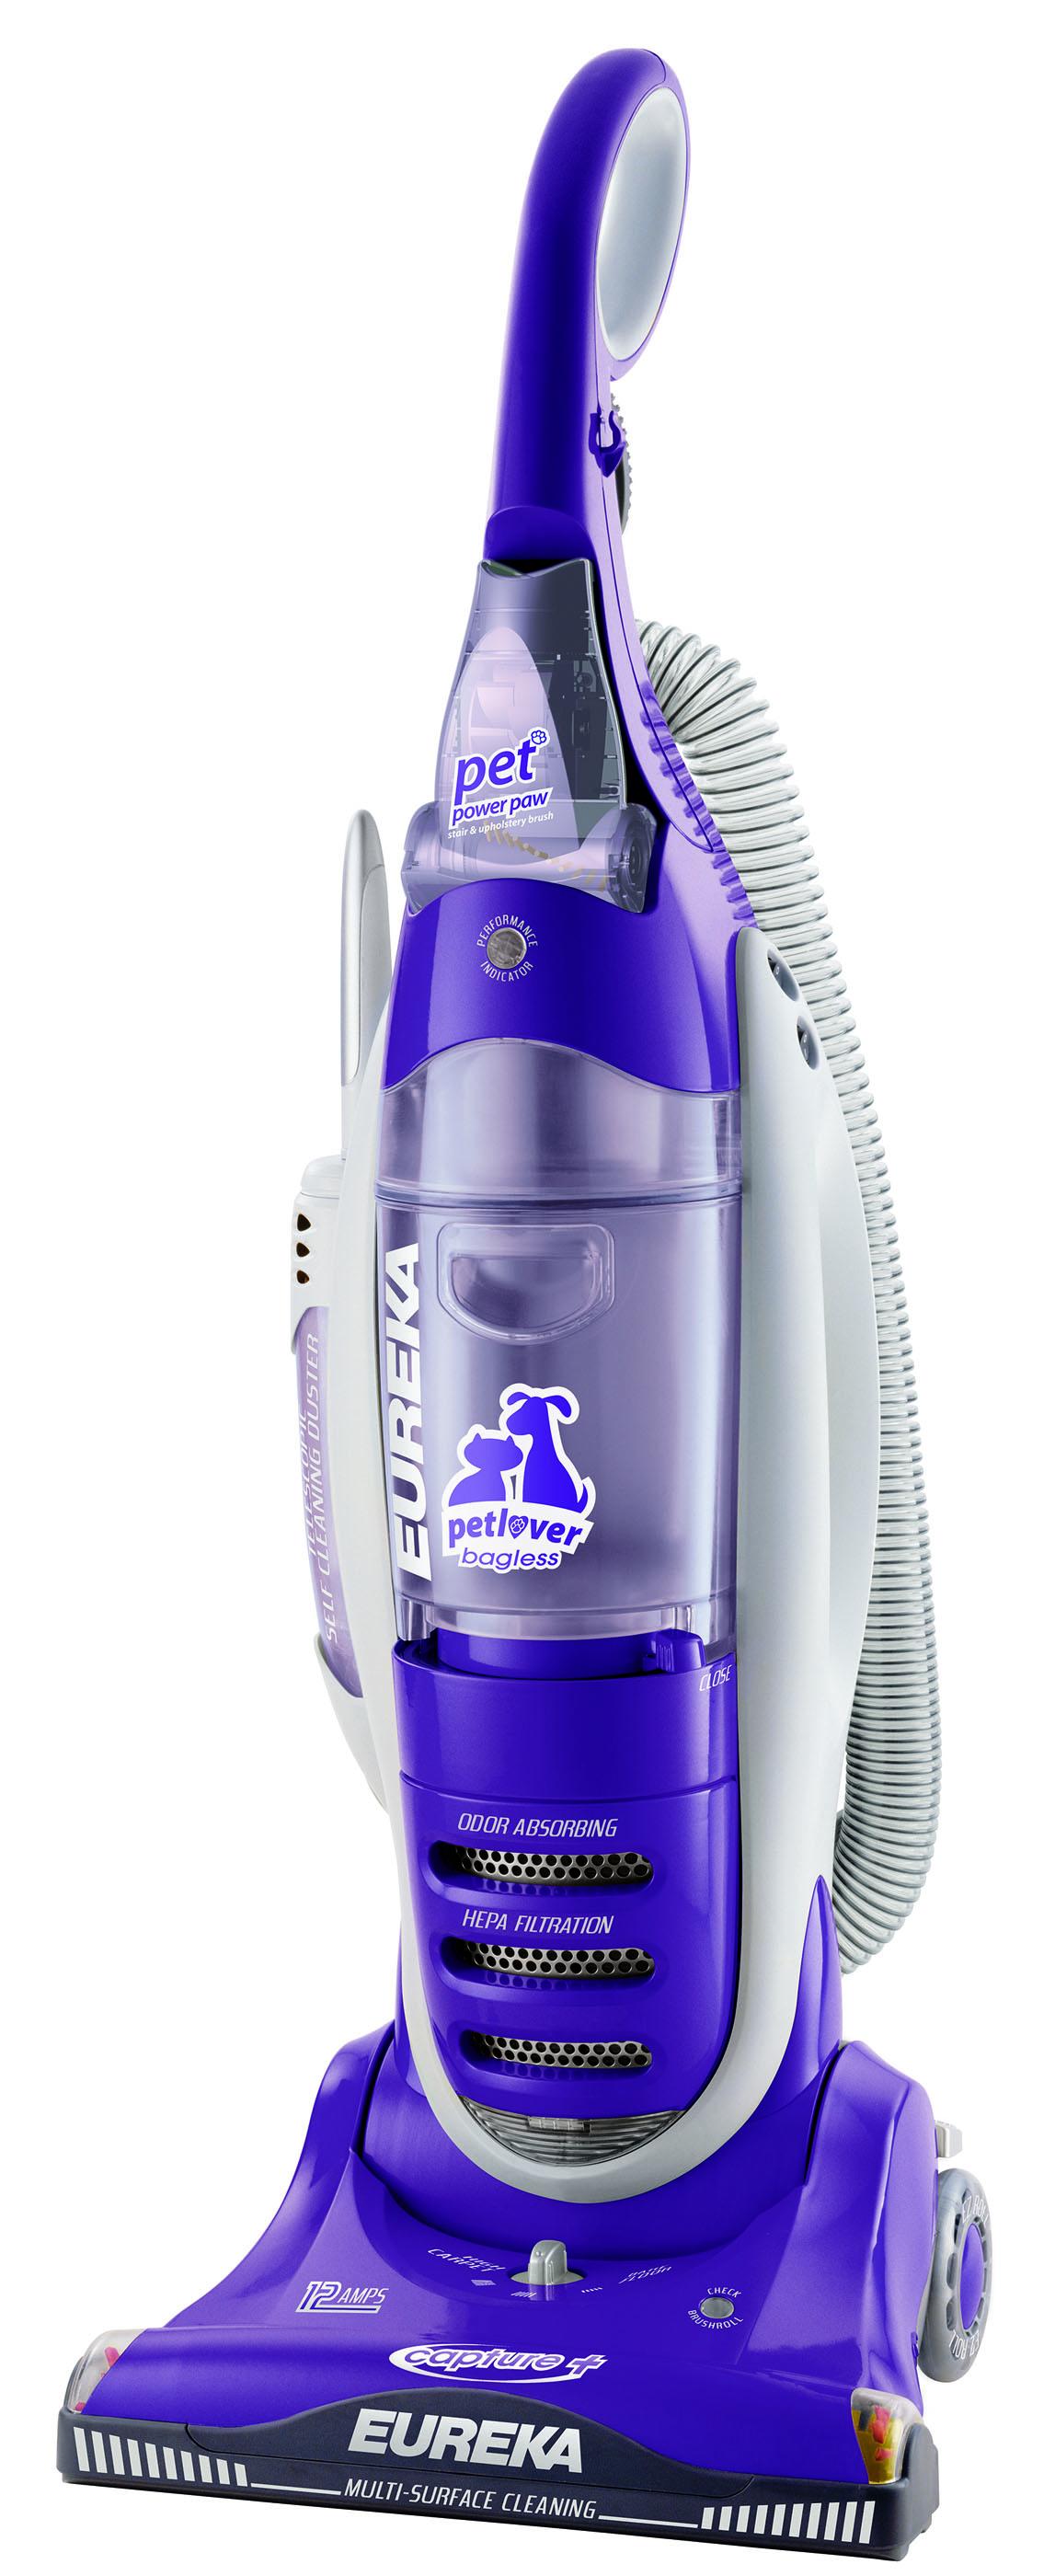 Eureka Pet Vacuum